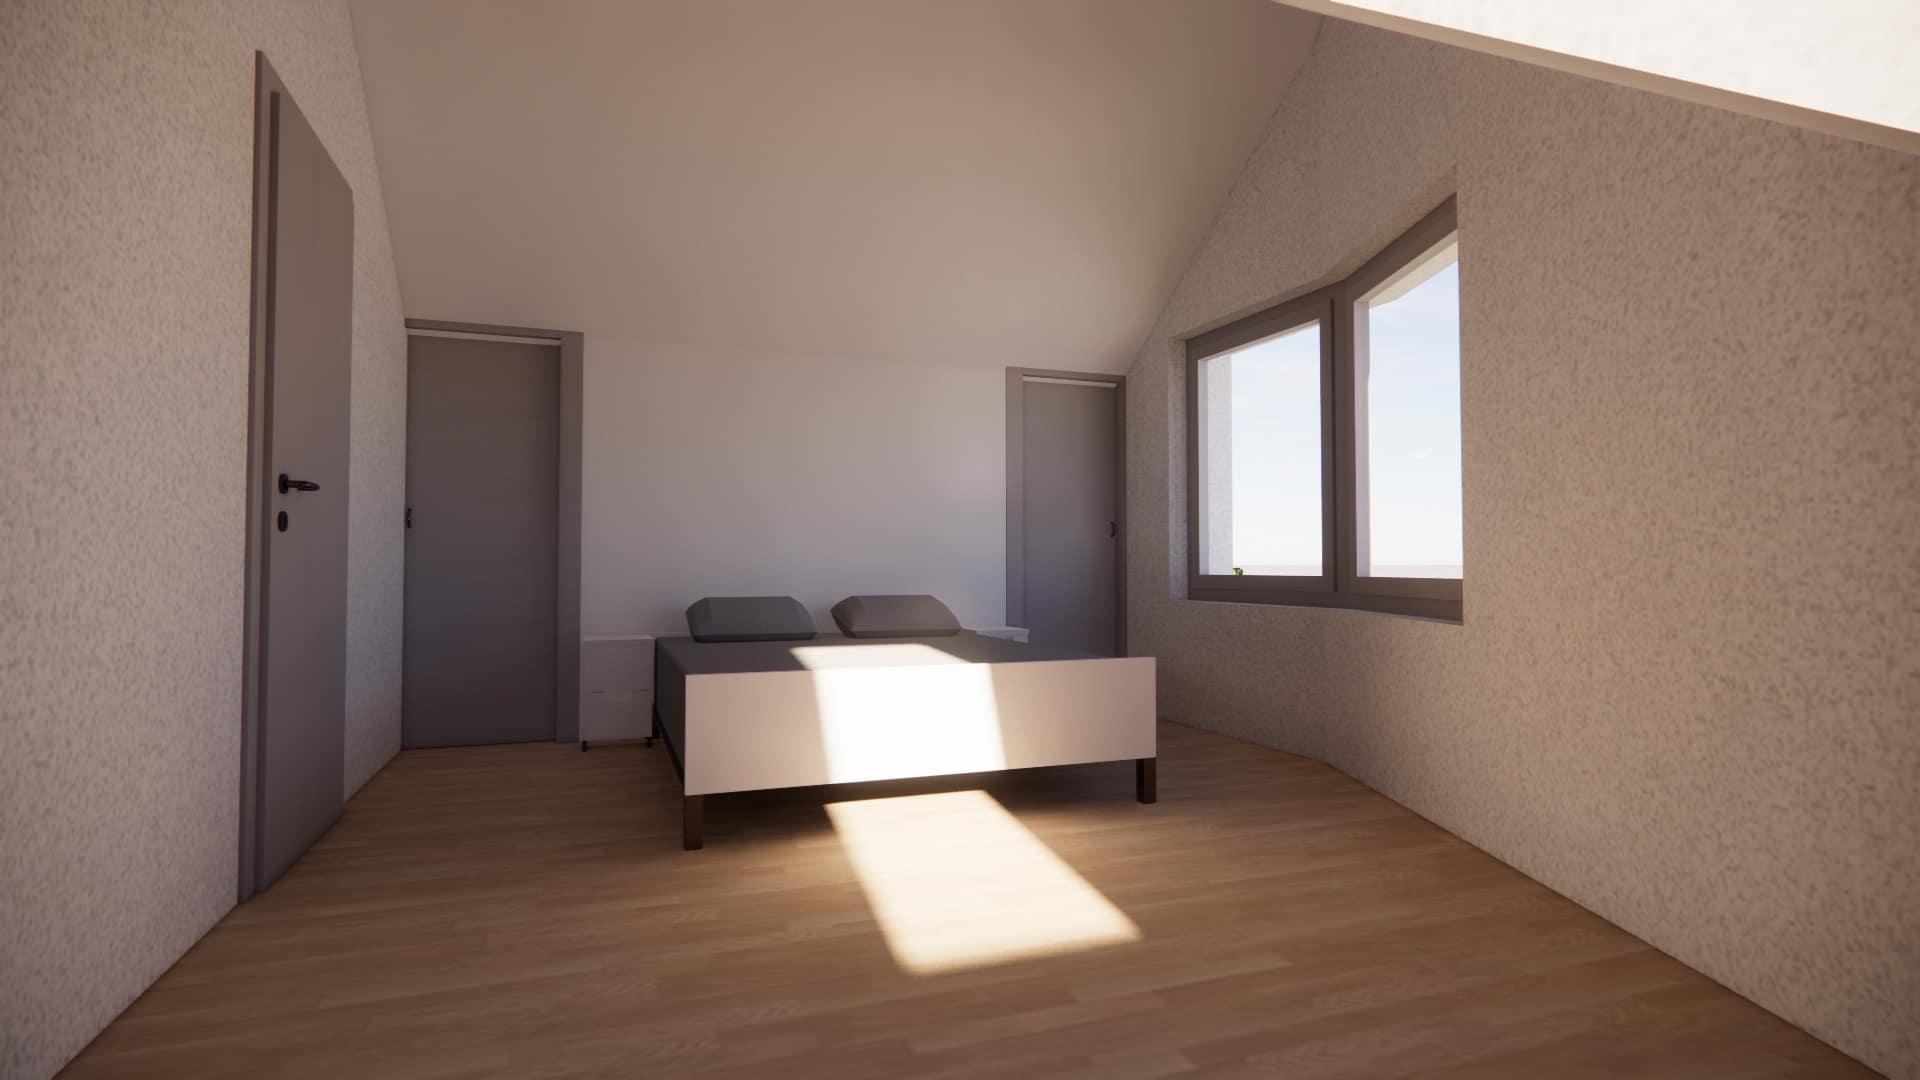 11-Zimmer 3 DG